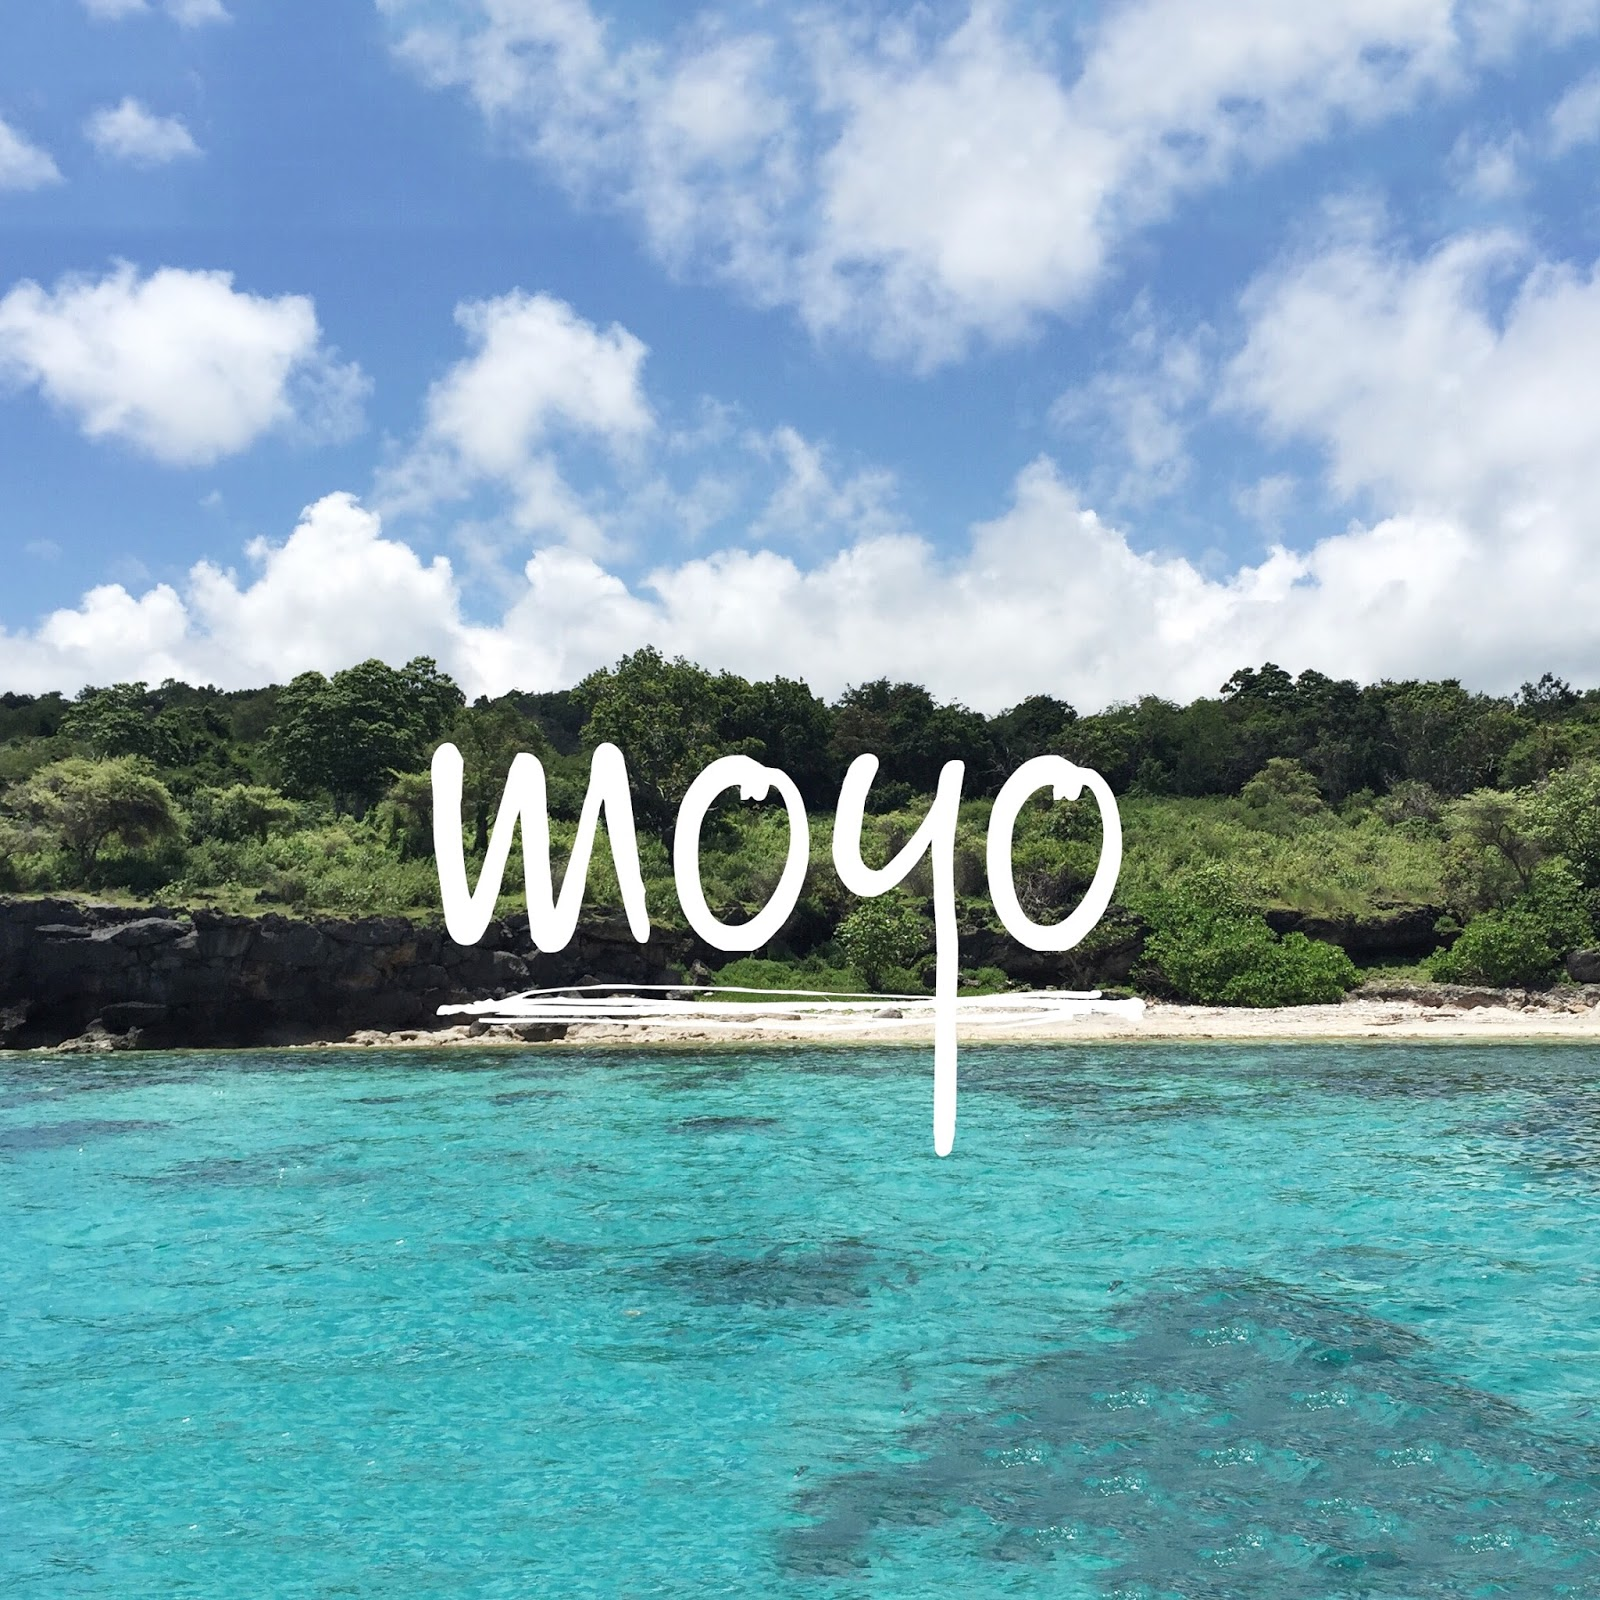 cerita febrian pengalaman sasaat di pulau moyo rh ceritafebrian com